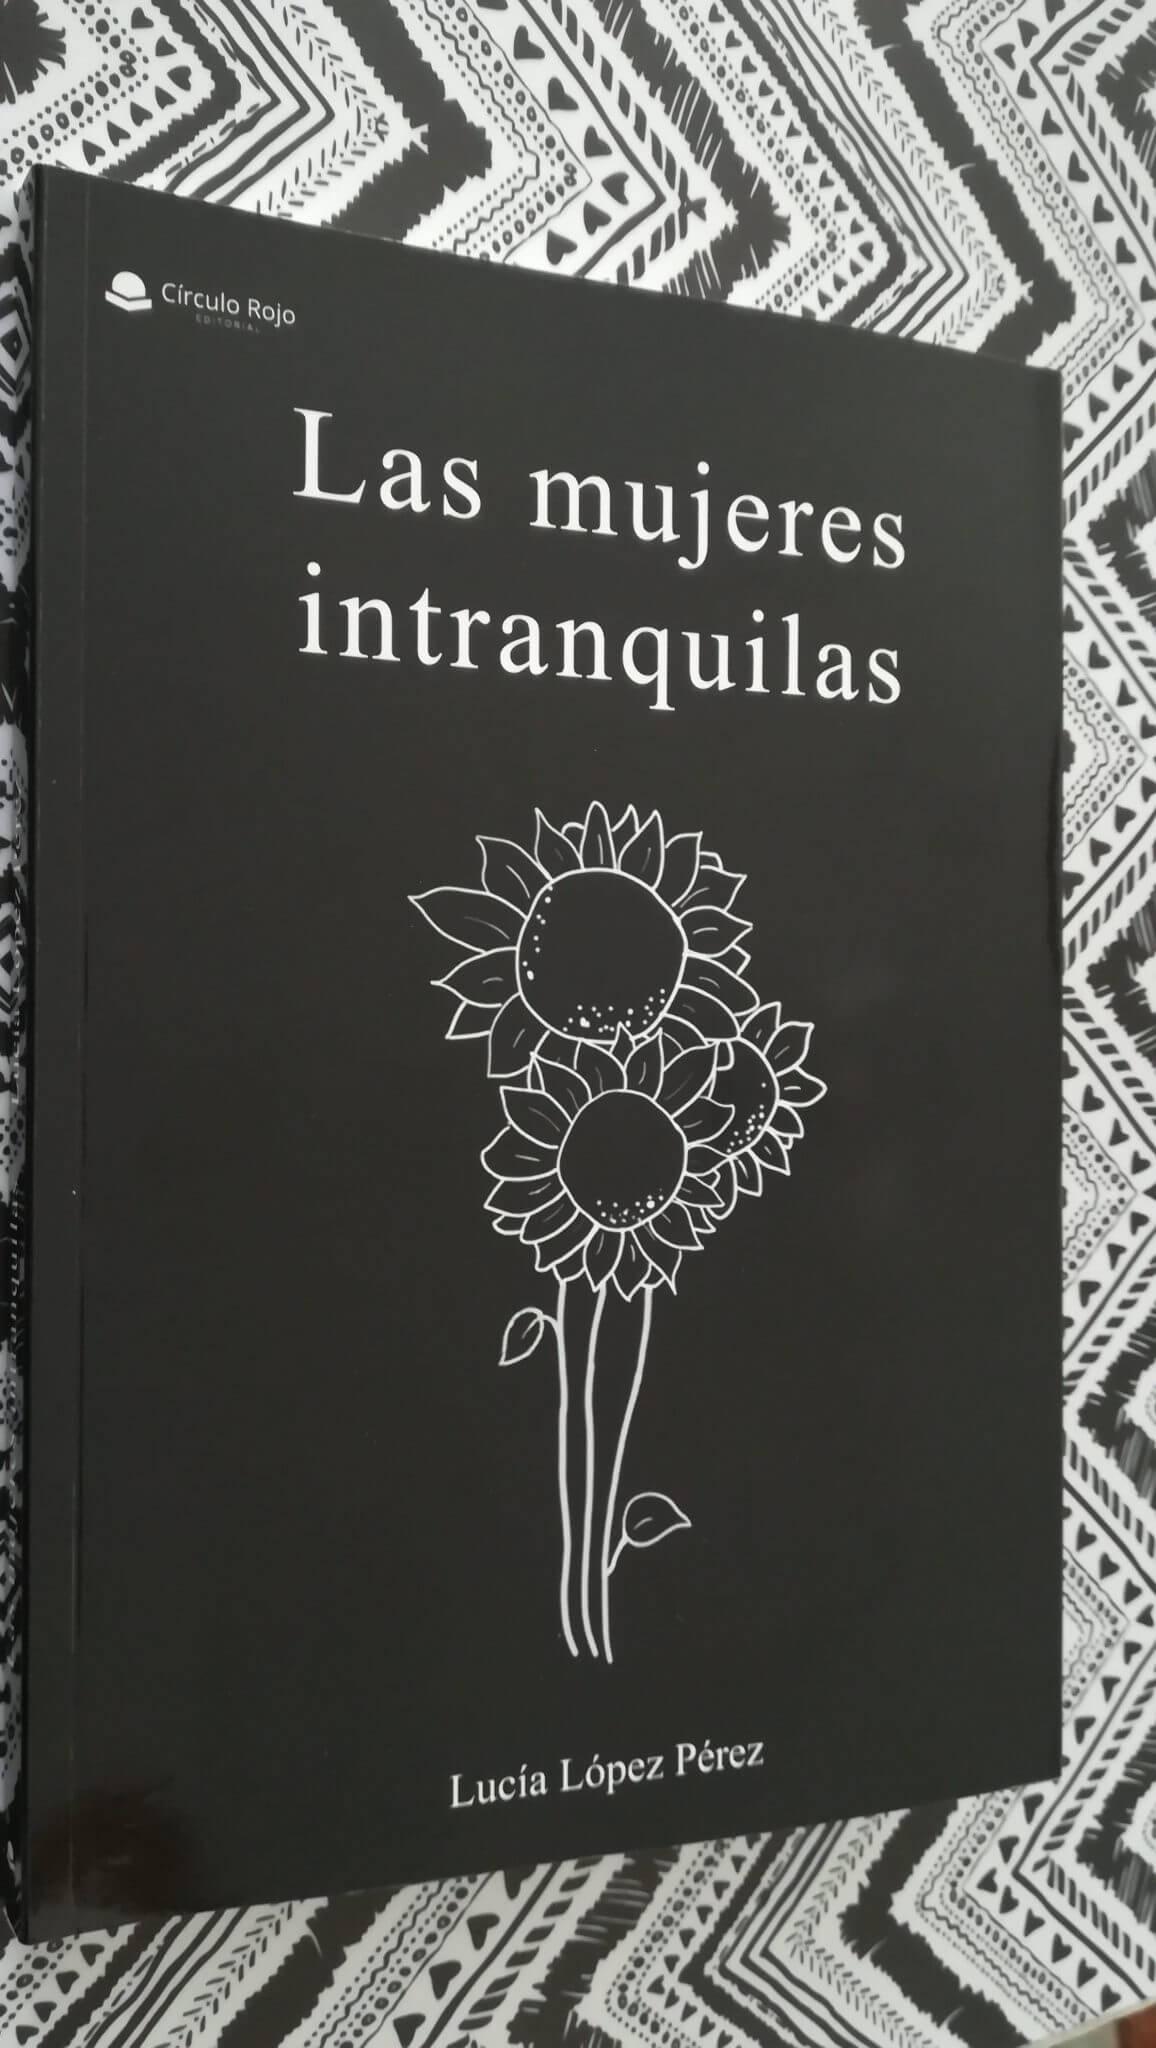 Las mujeres intranquilas – Lucía López Pérez